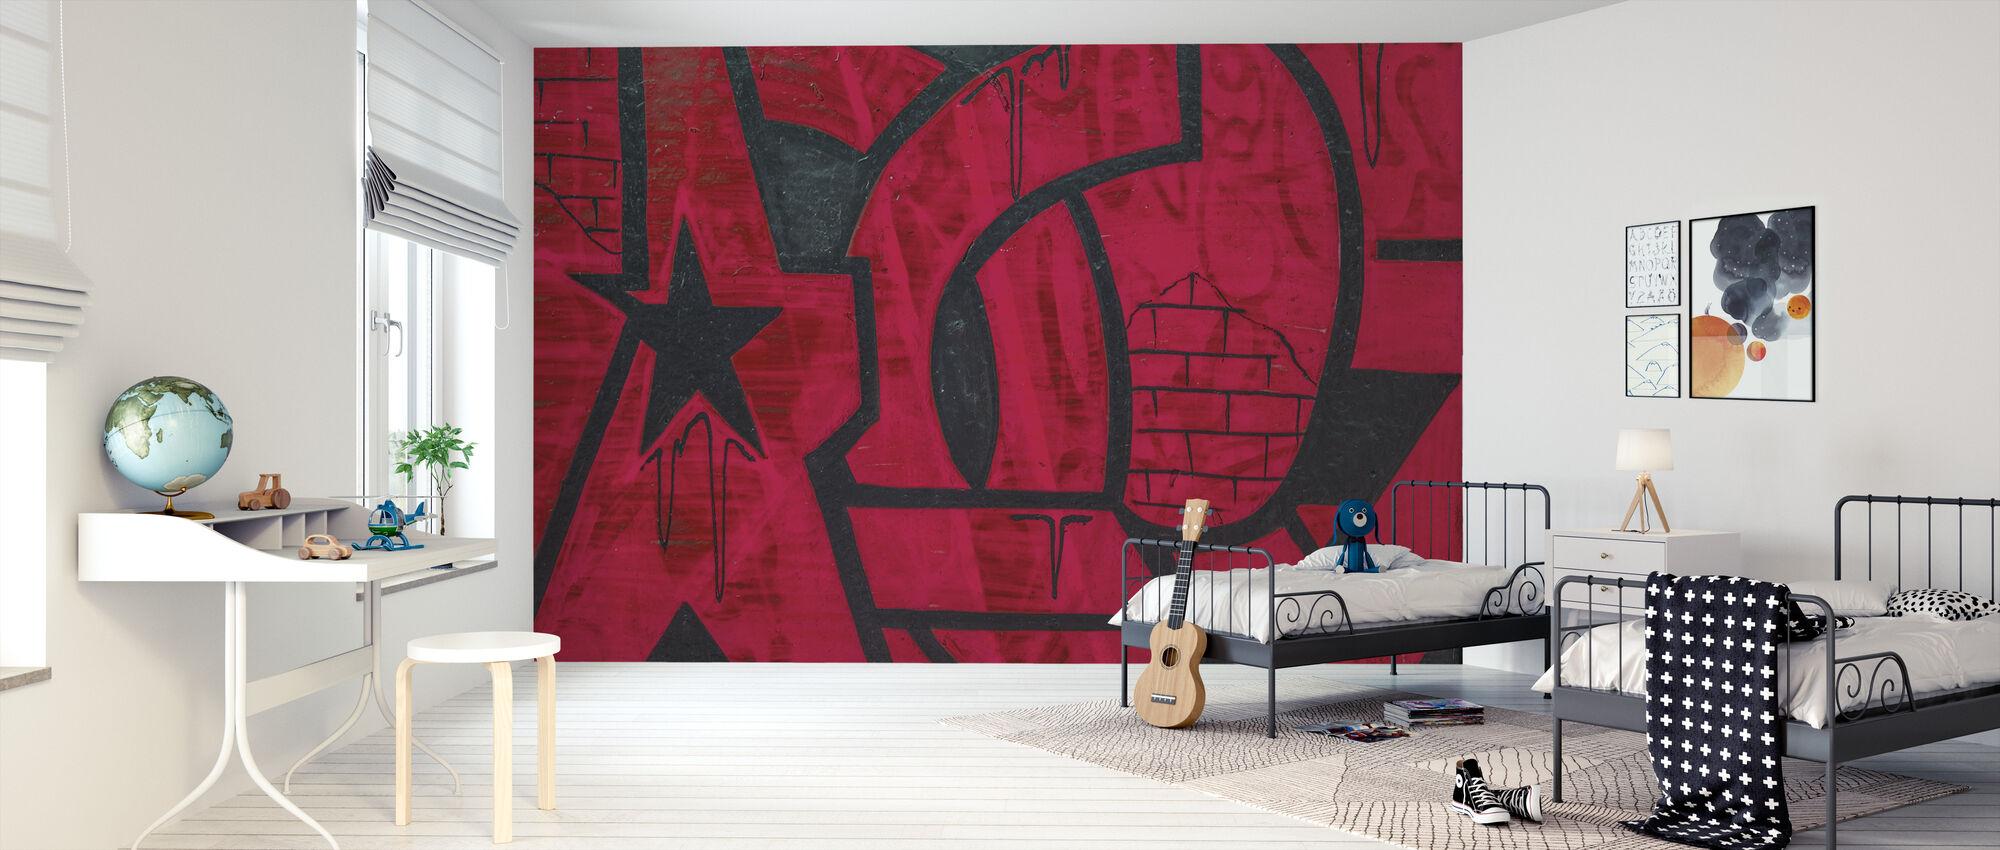 Red Detail from Graffiti Wall - Wallpaper - Kids Room